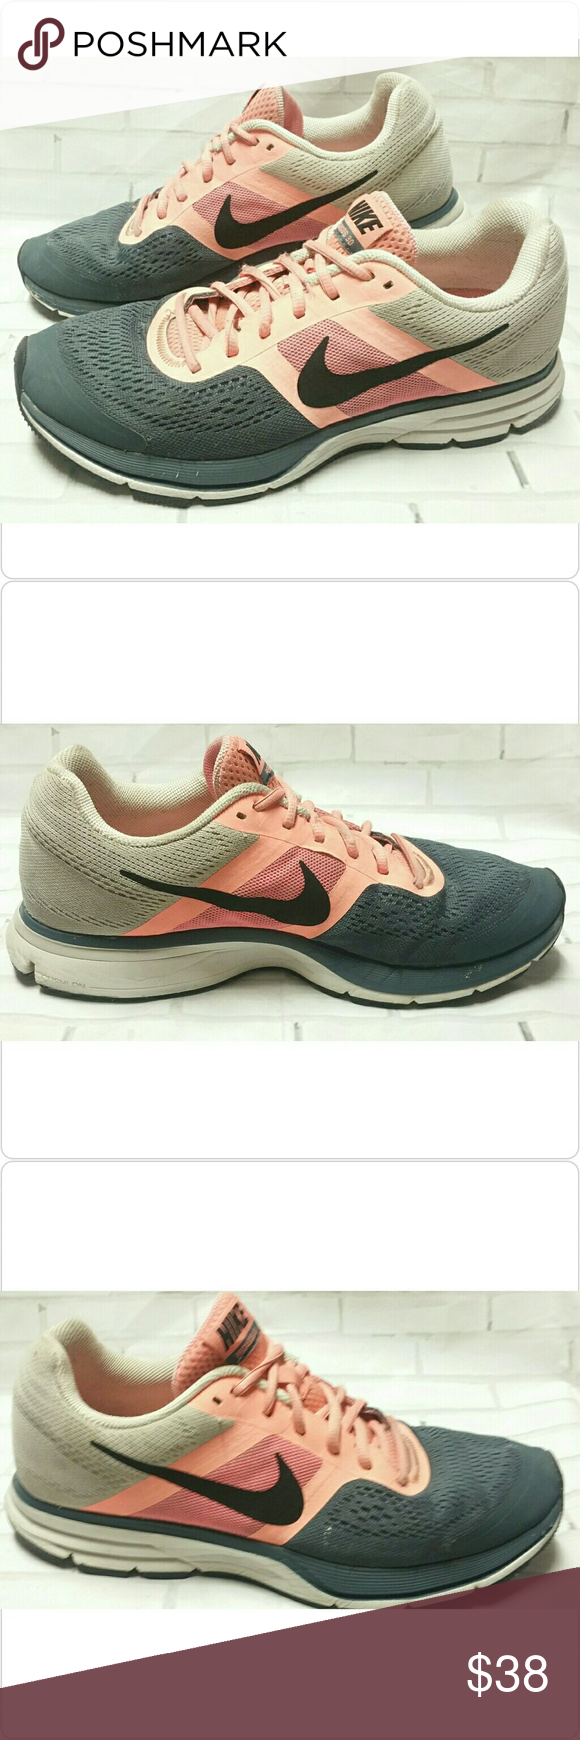 1150309e8bb1 Nike Air Pegasus 30 Womens Running shoes sz 11.5